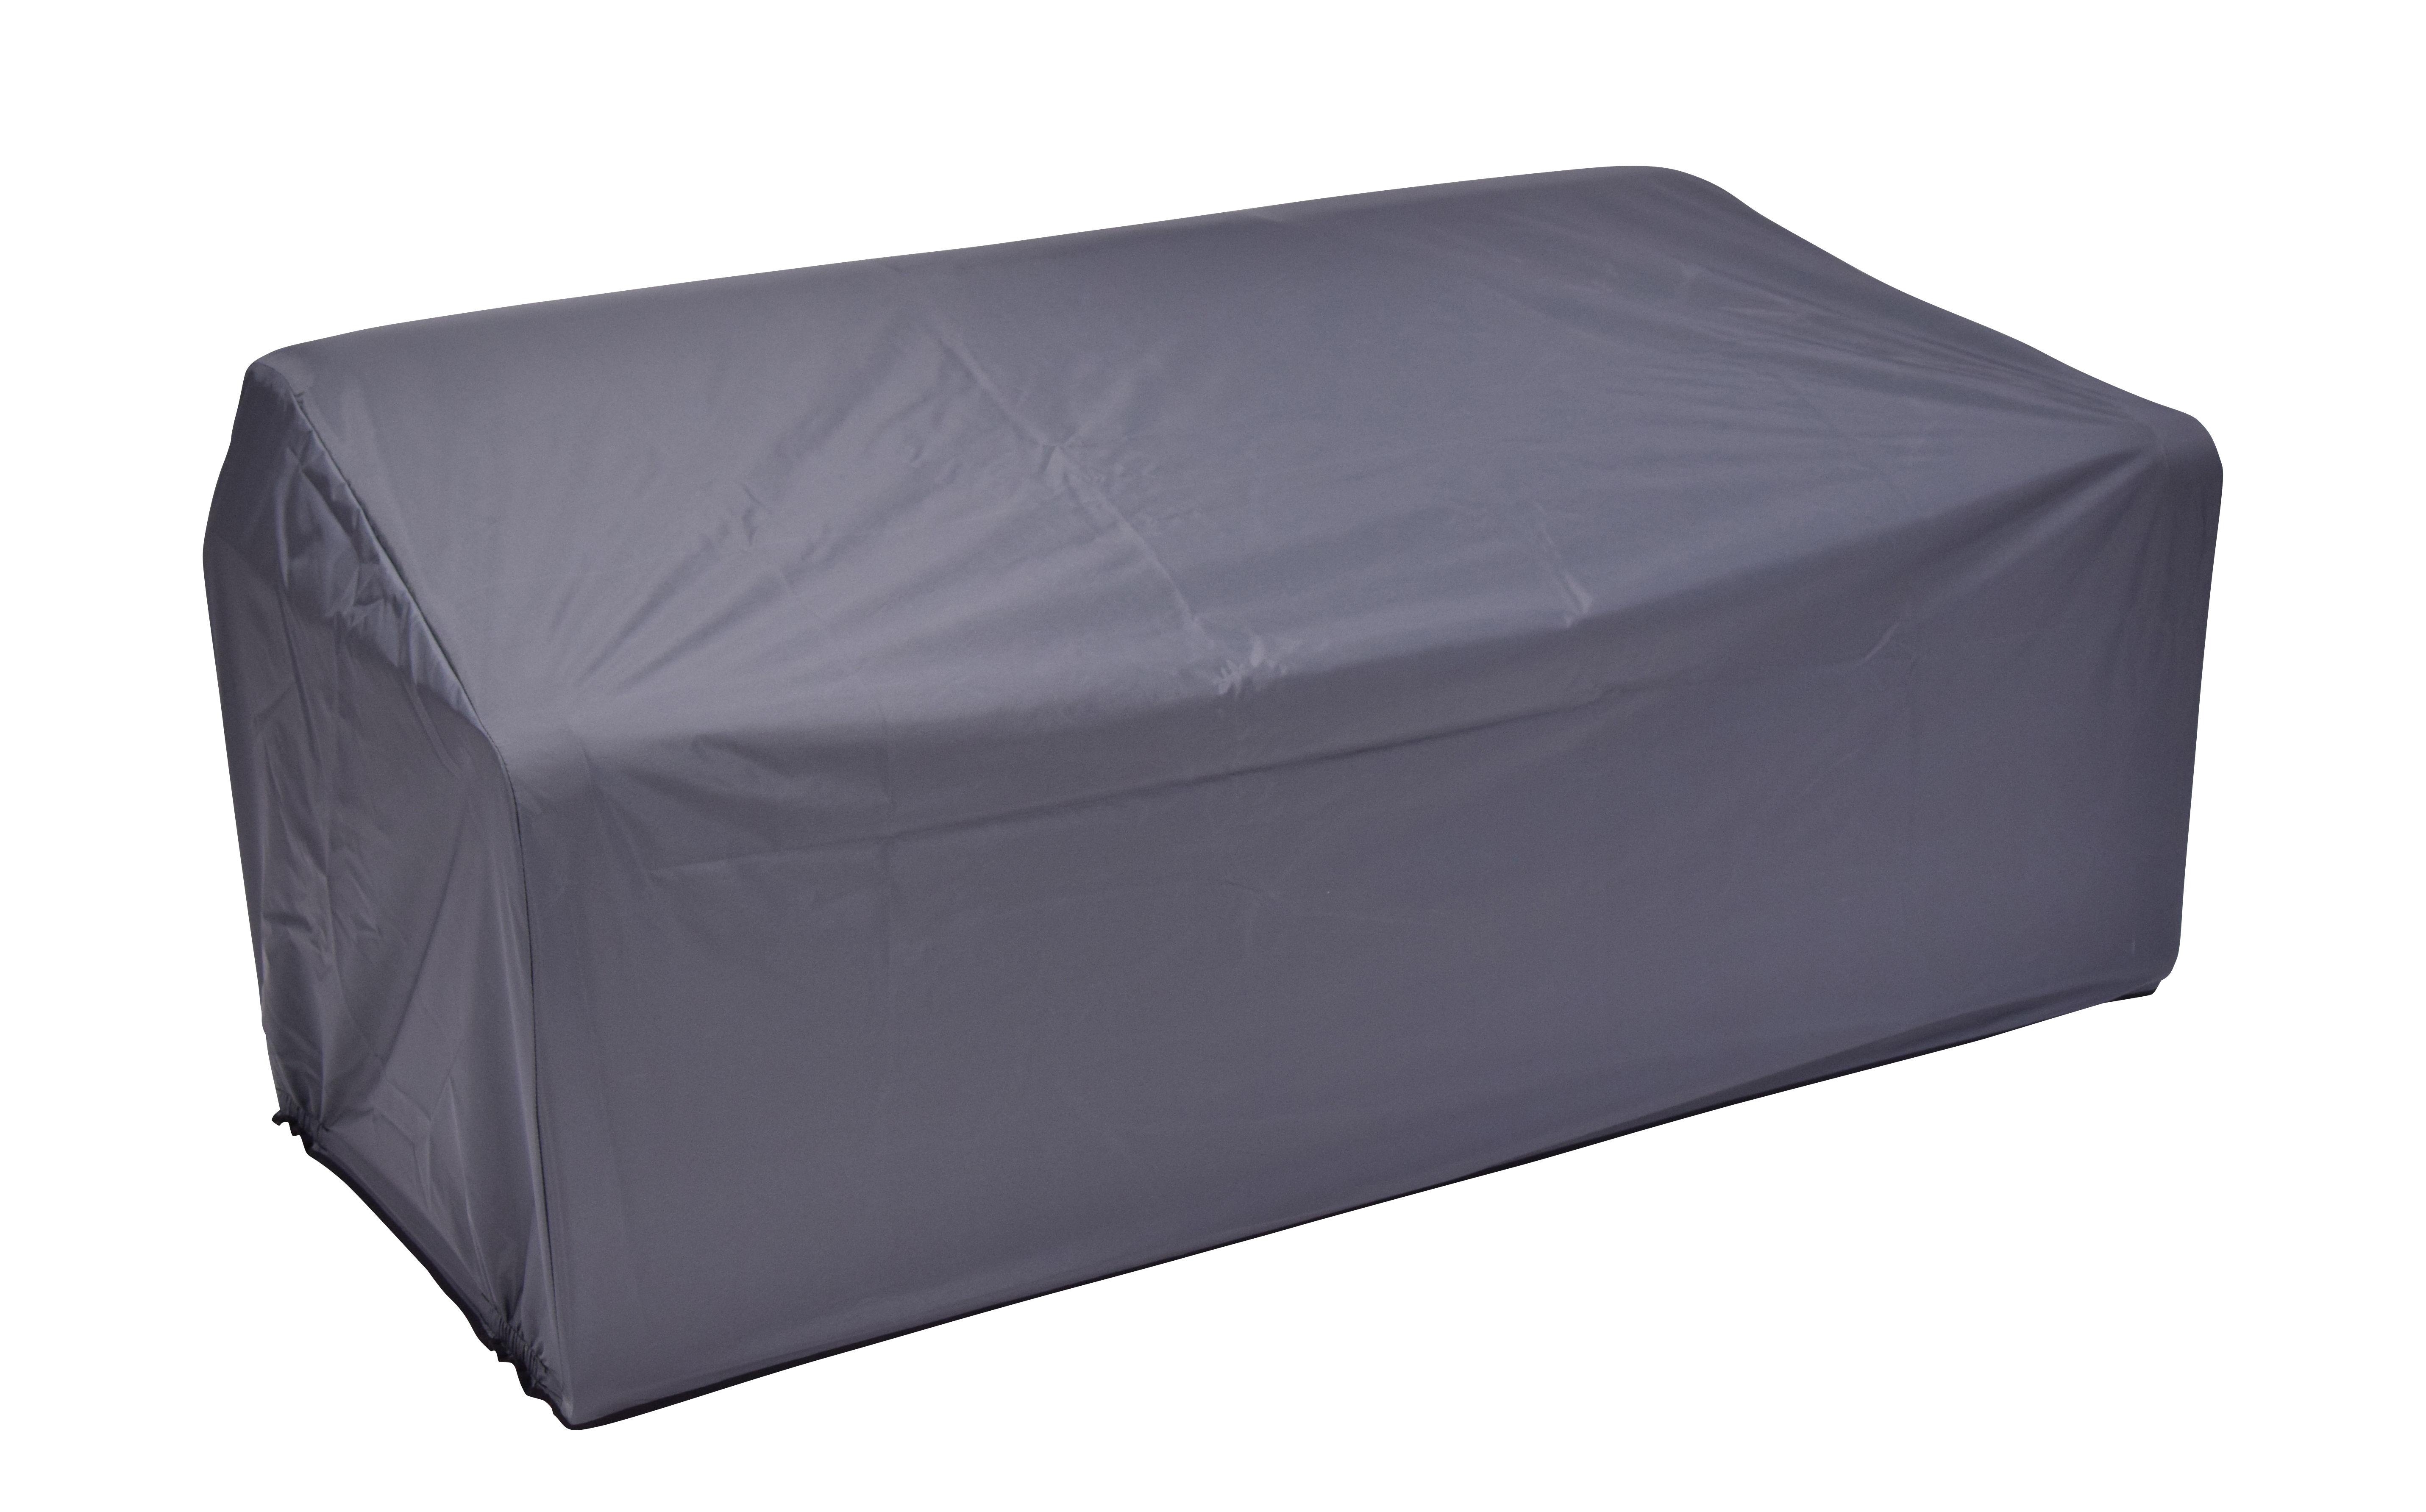 housse de protection pour canap bellevie carbone fermob made in design. Black Bedroom Furniture Sets. Home Design Ideas